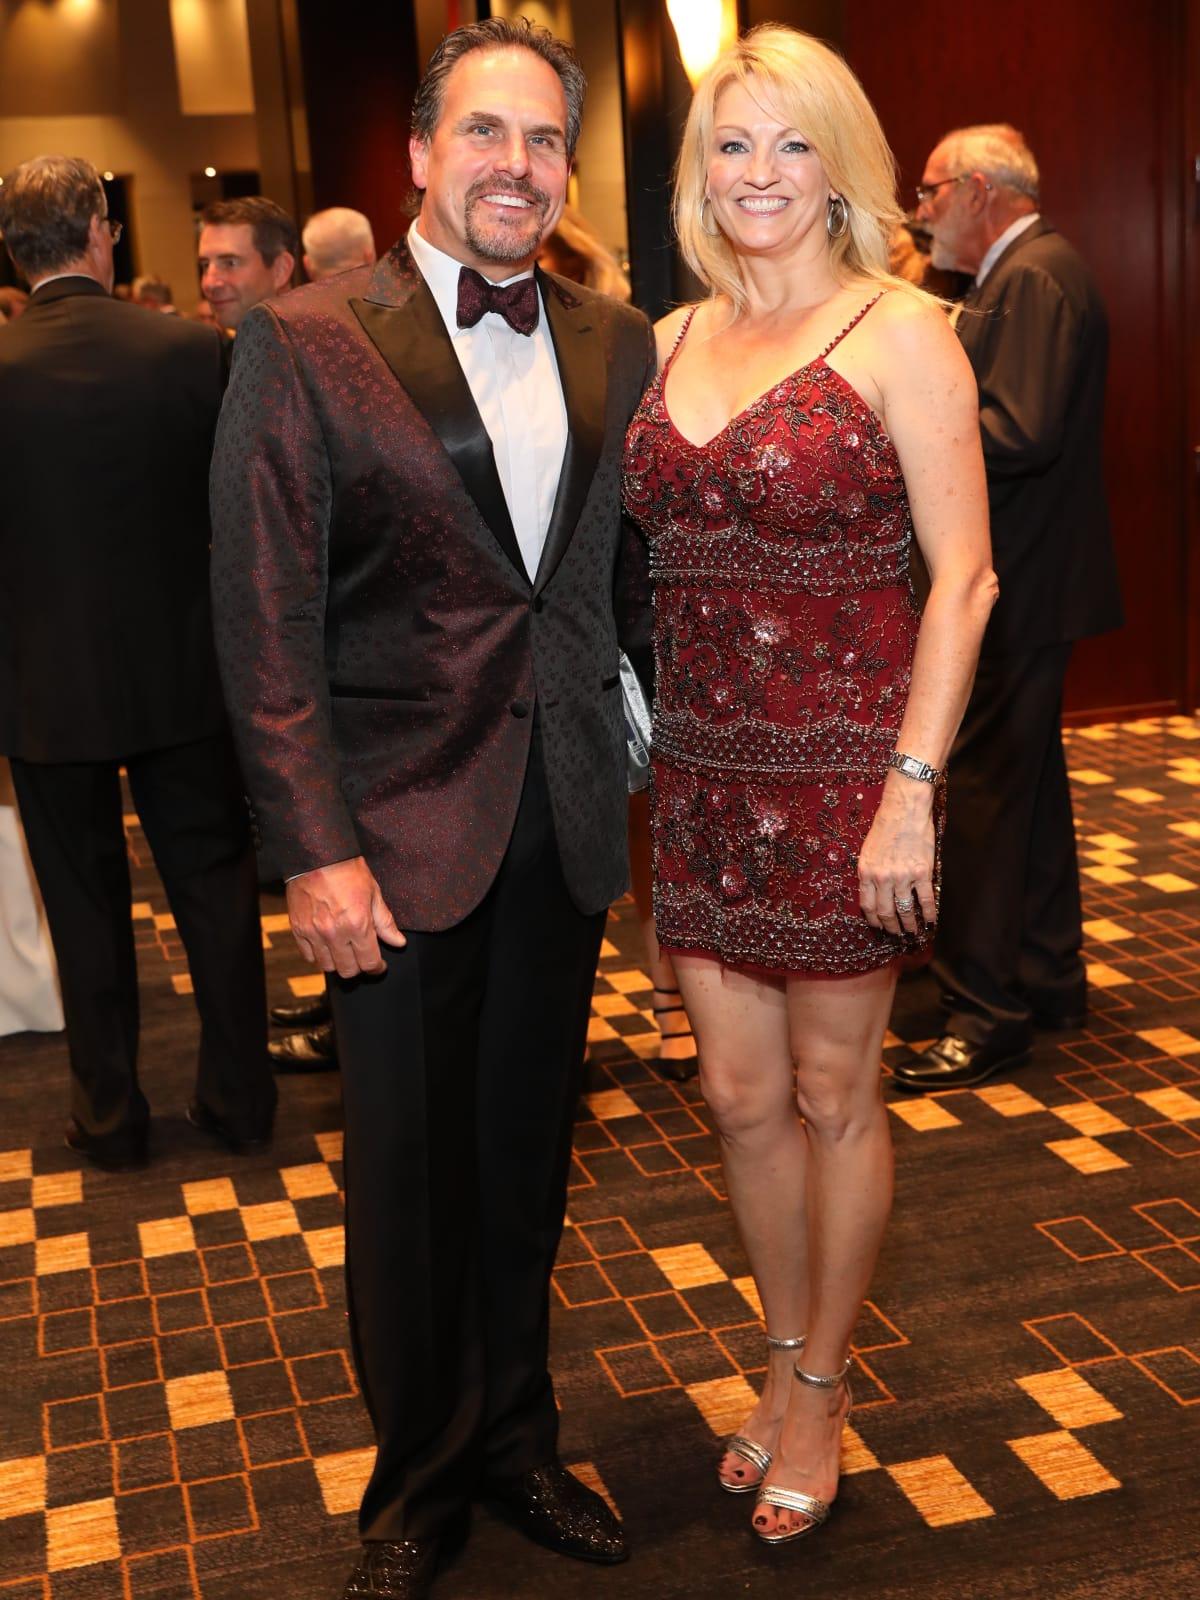 Duke and CC Ensell at Festari Gala